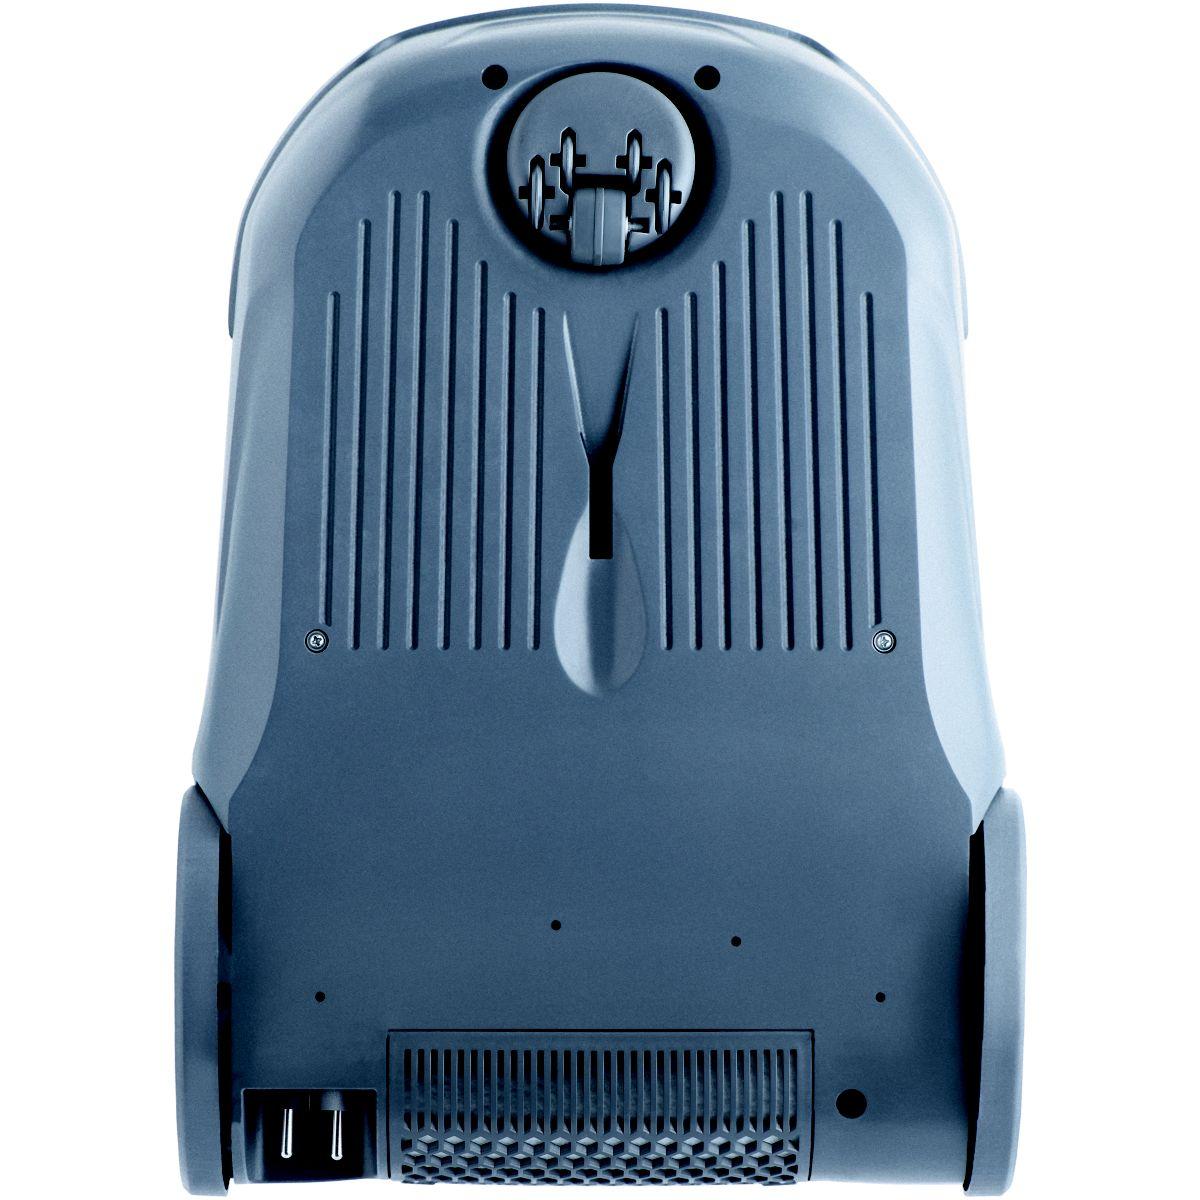 thomas perfect air allergy pure 786526 aspirateur tra neau sans sac comparer avec. Black Bedroom Furniture Sets. Home Design Ideas